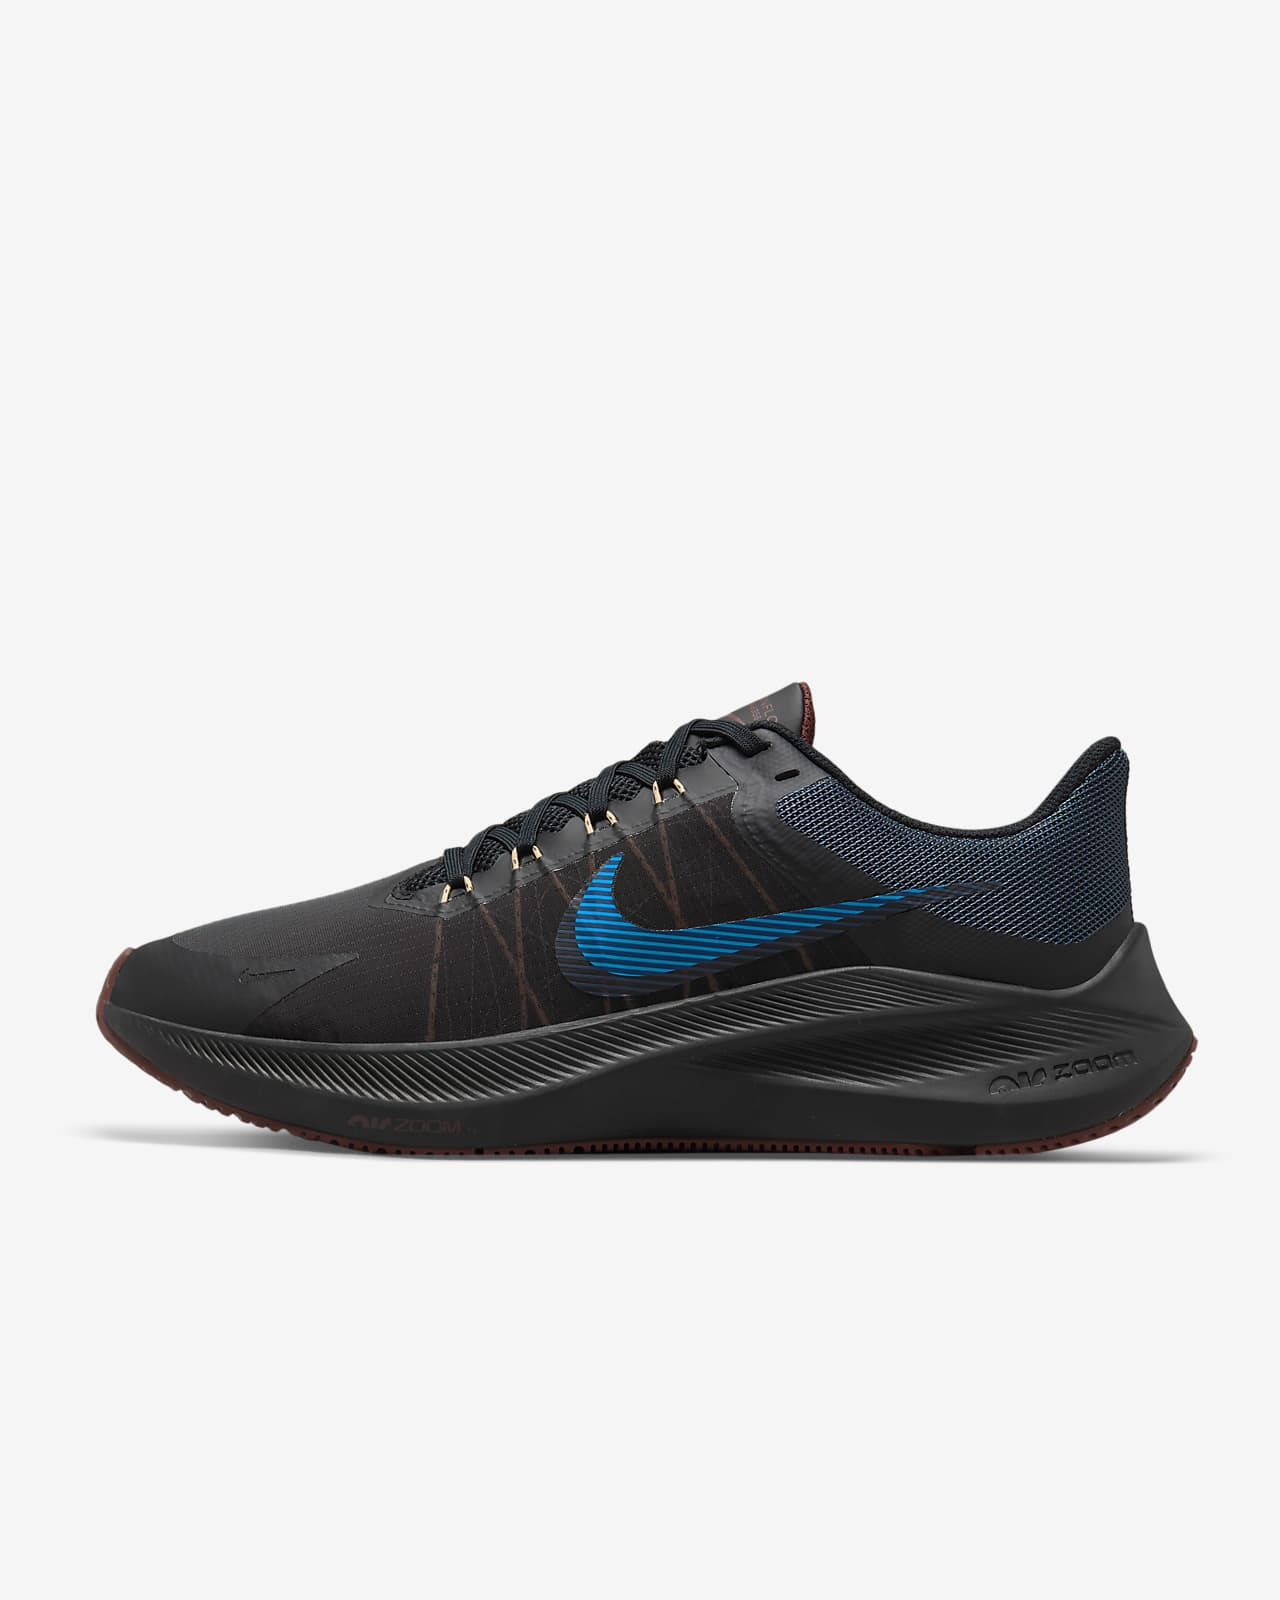 Calzado de running de carretera para hombre Nike Winflo 8